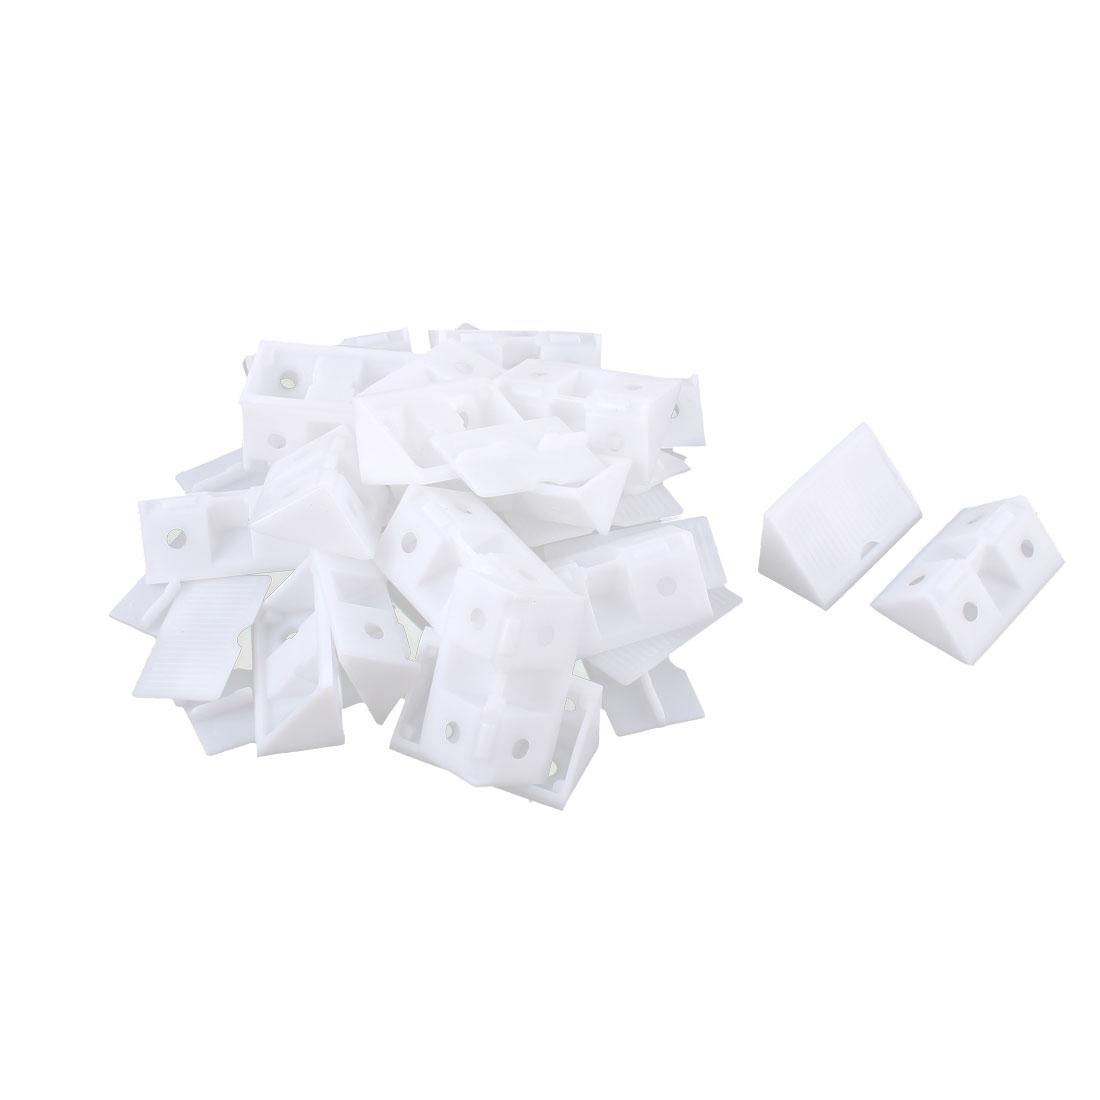 Shelf Cabinet Plastic 90 Degree Angle Brackets White 20pcs